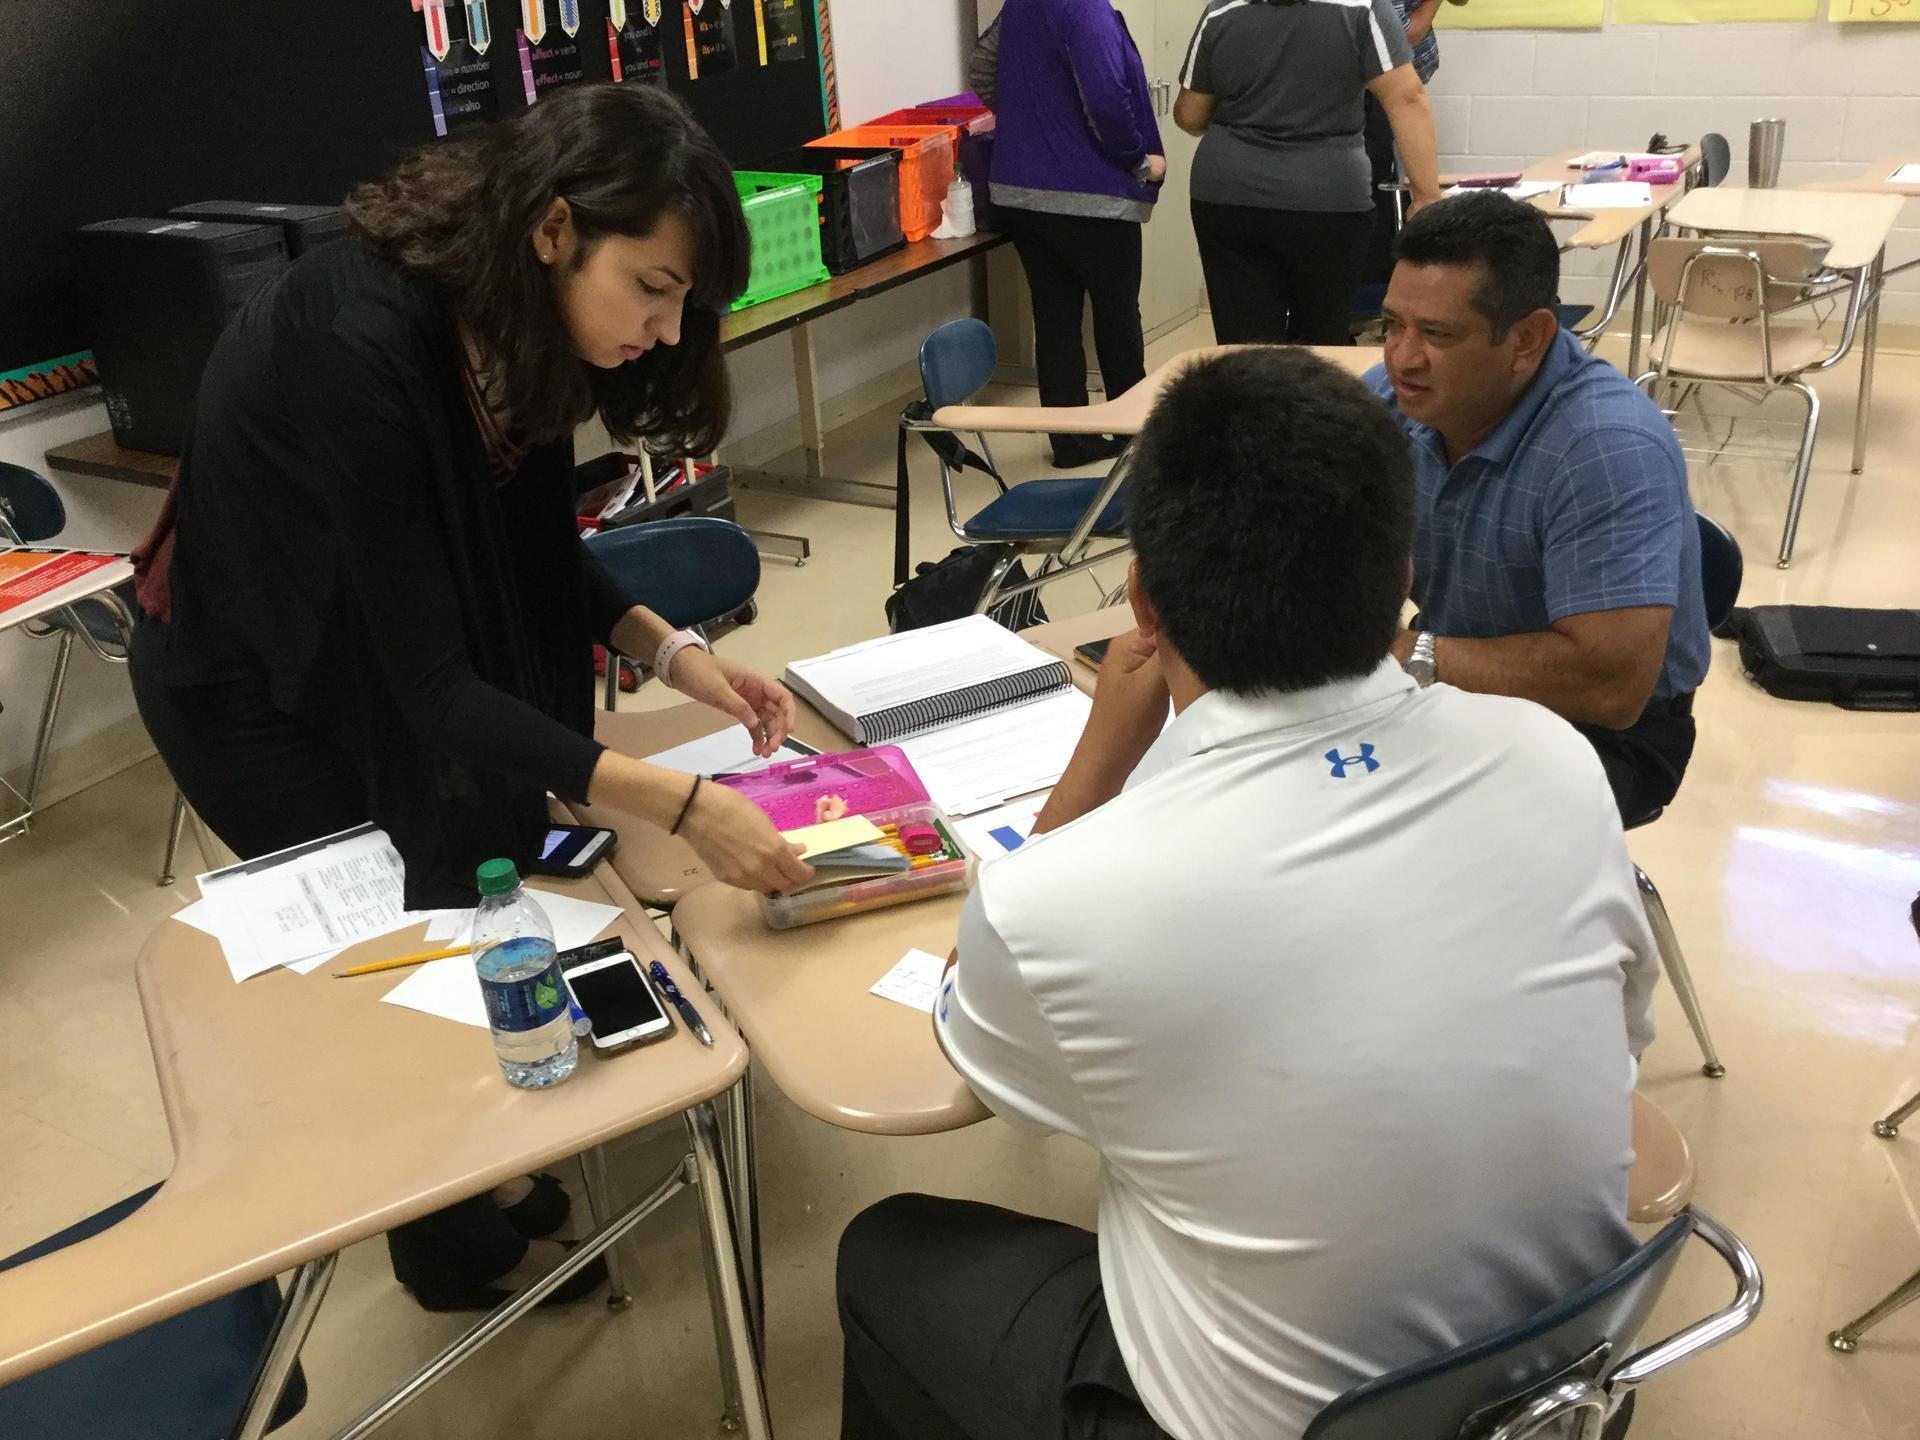 Teachers around a desk